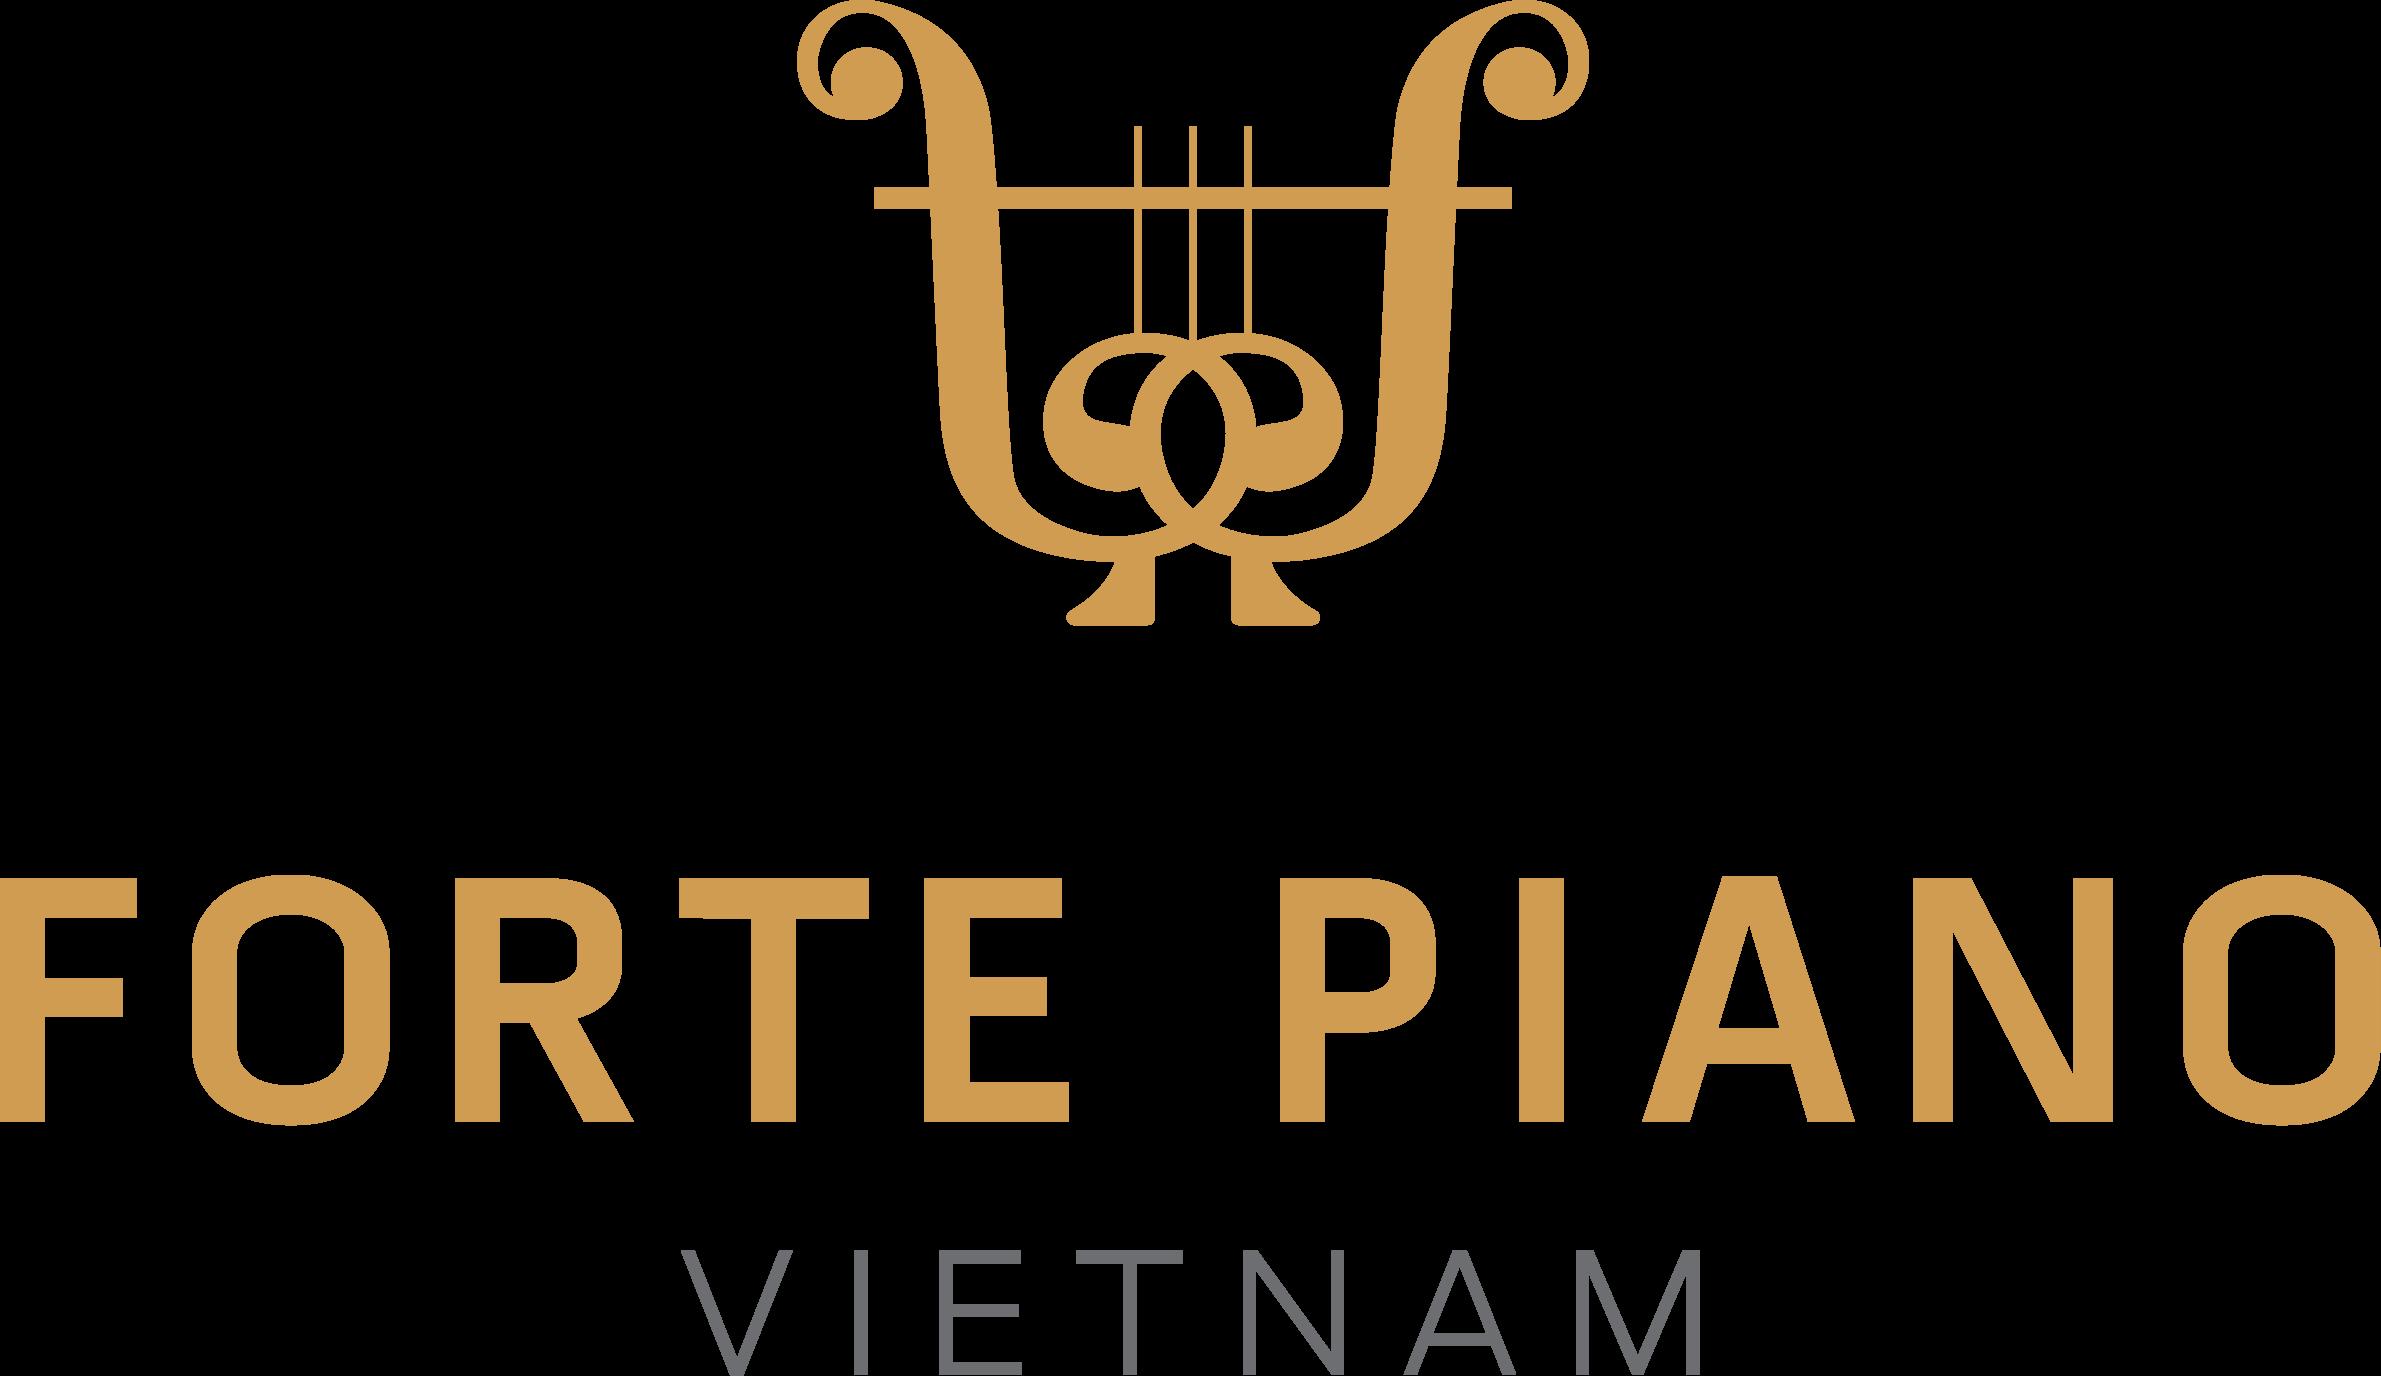 Piano Forte Viet Nam